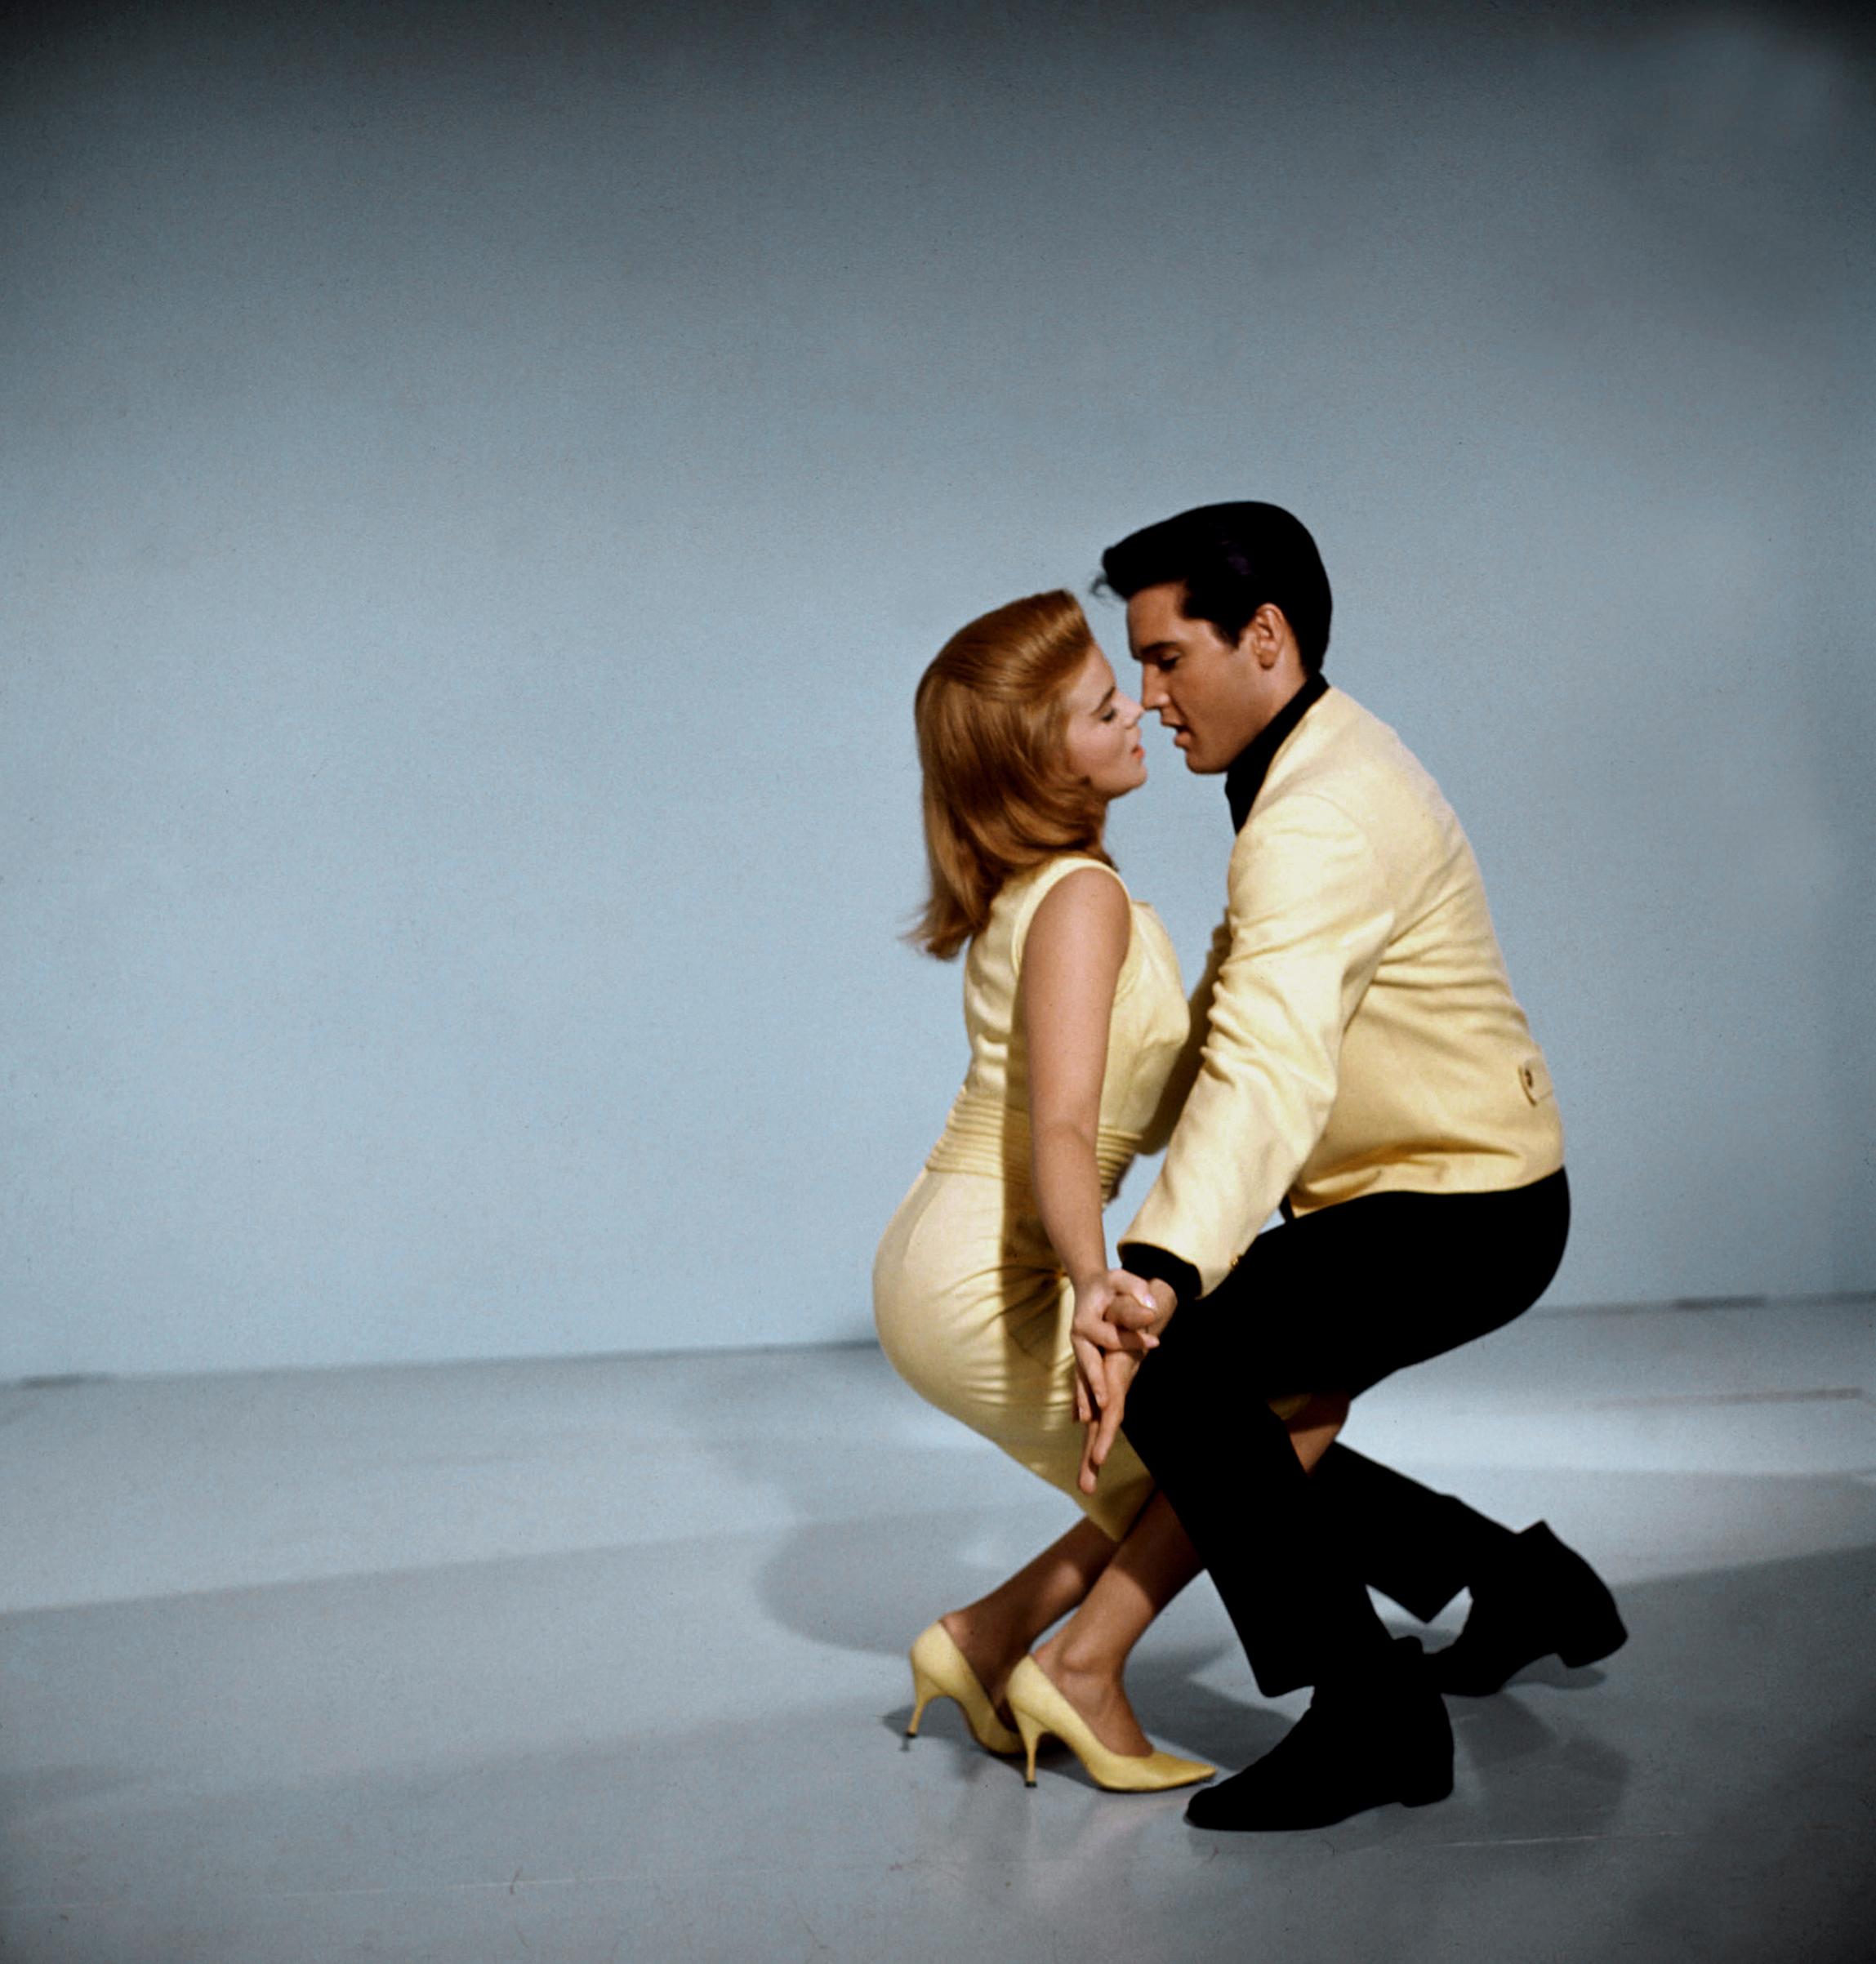 Elvis and Ann-Margret promoting the movie  Viva Las Vegas 1964.